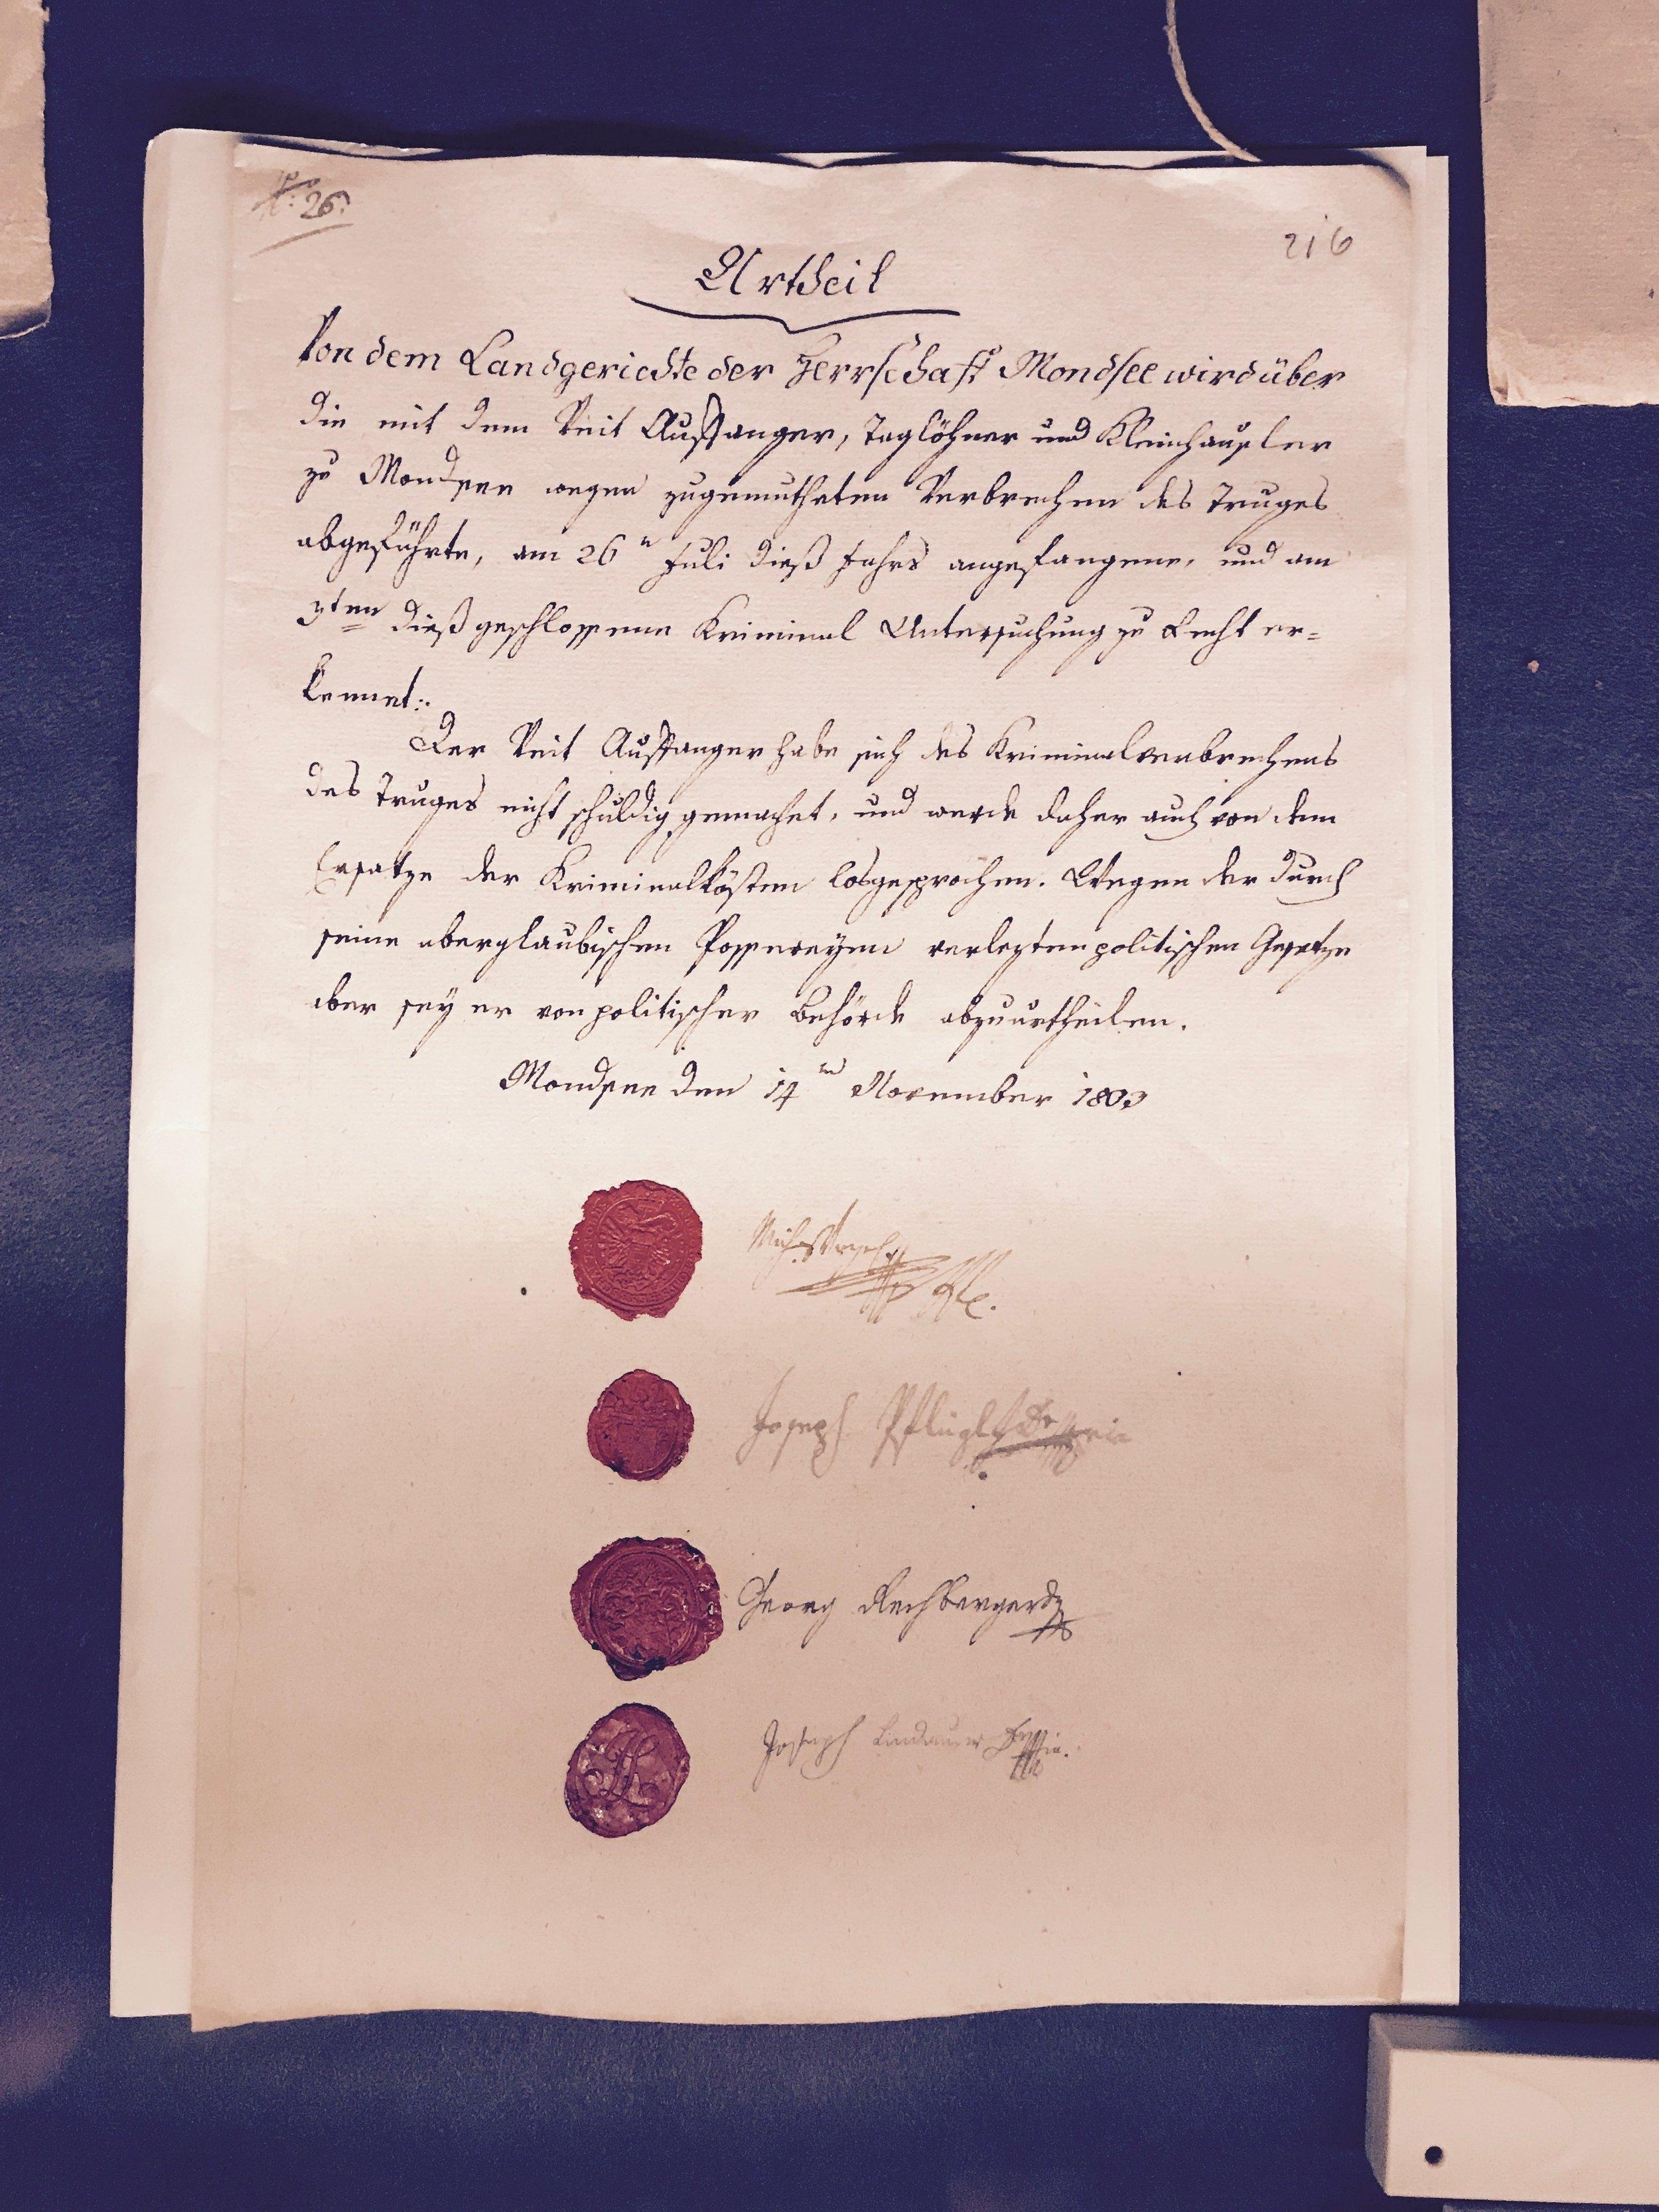 official 1803 verdict in a lawsuit against folk-magic